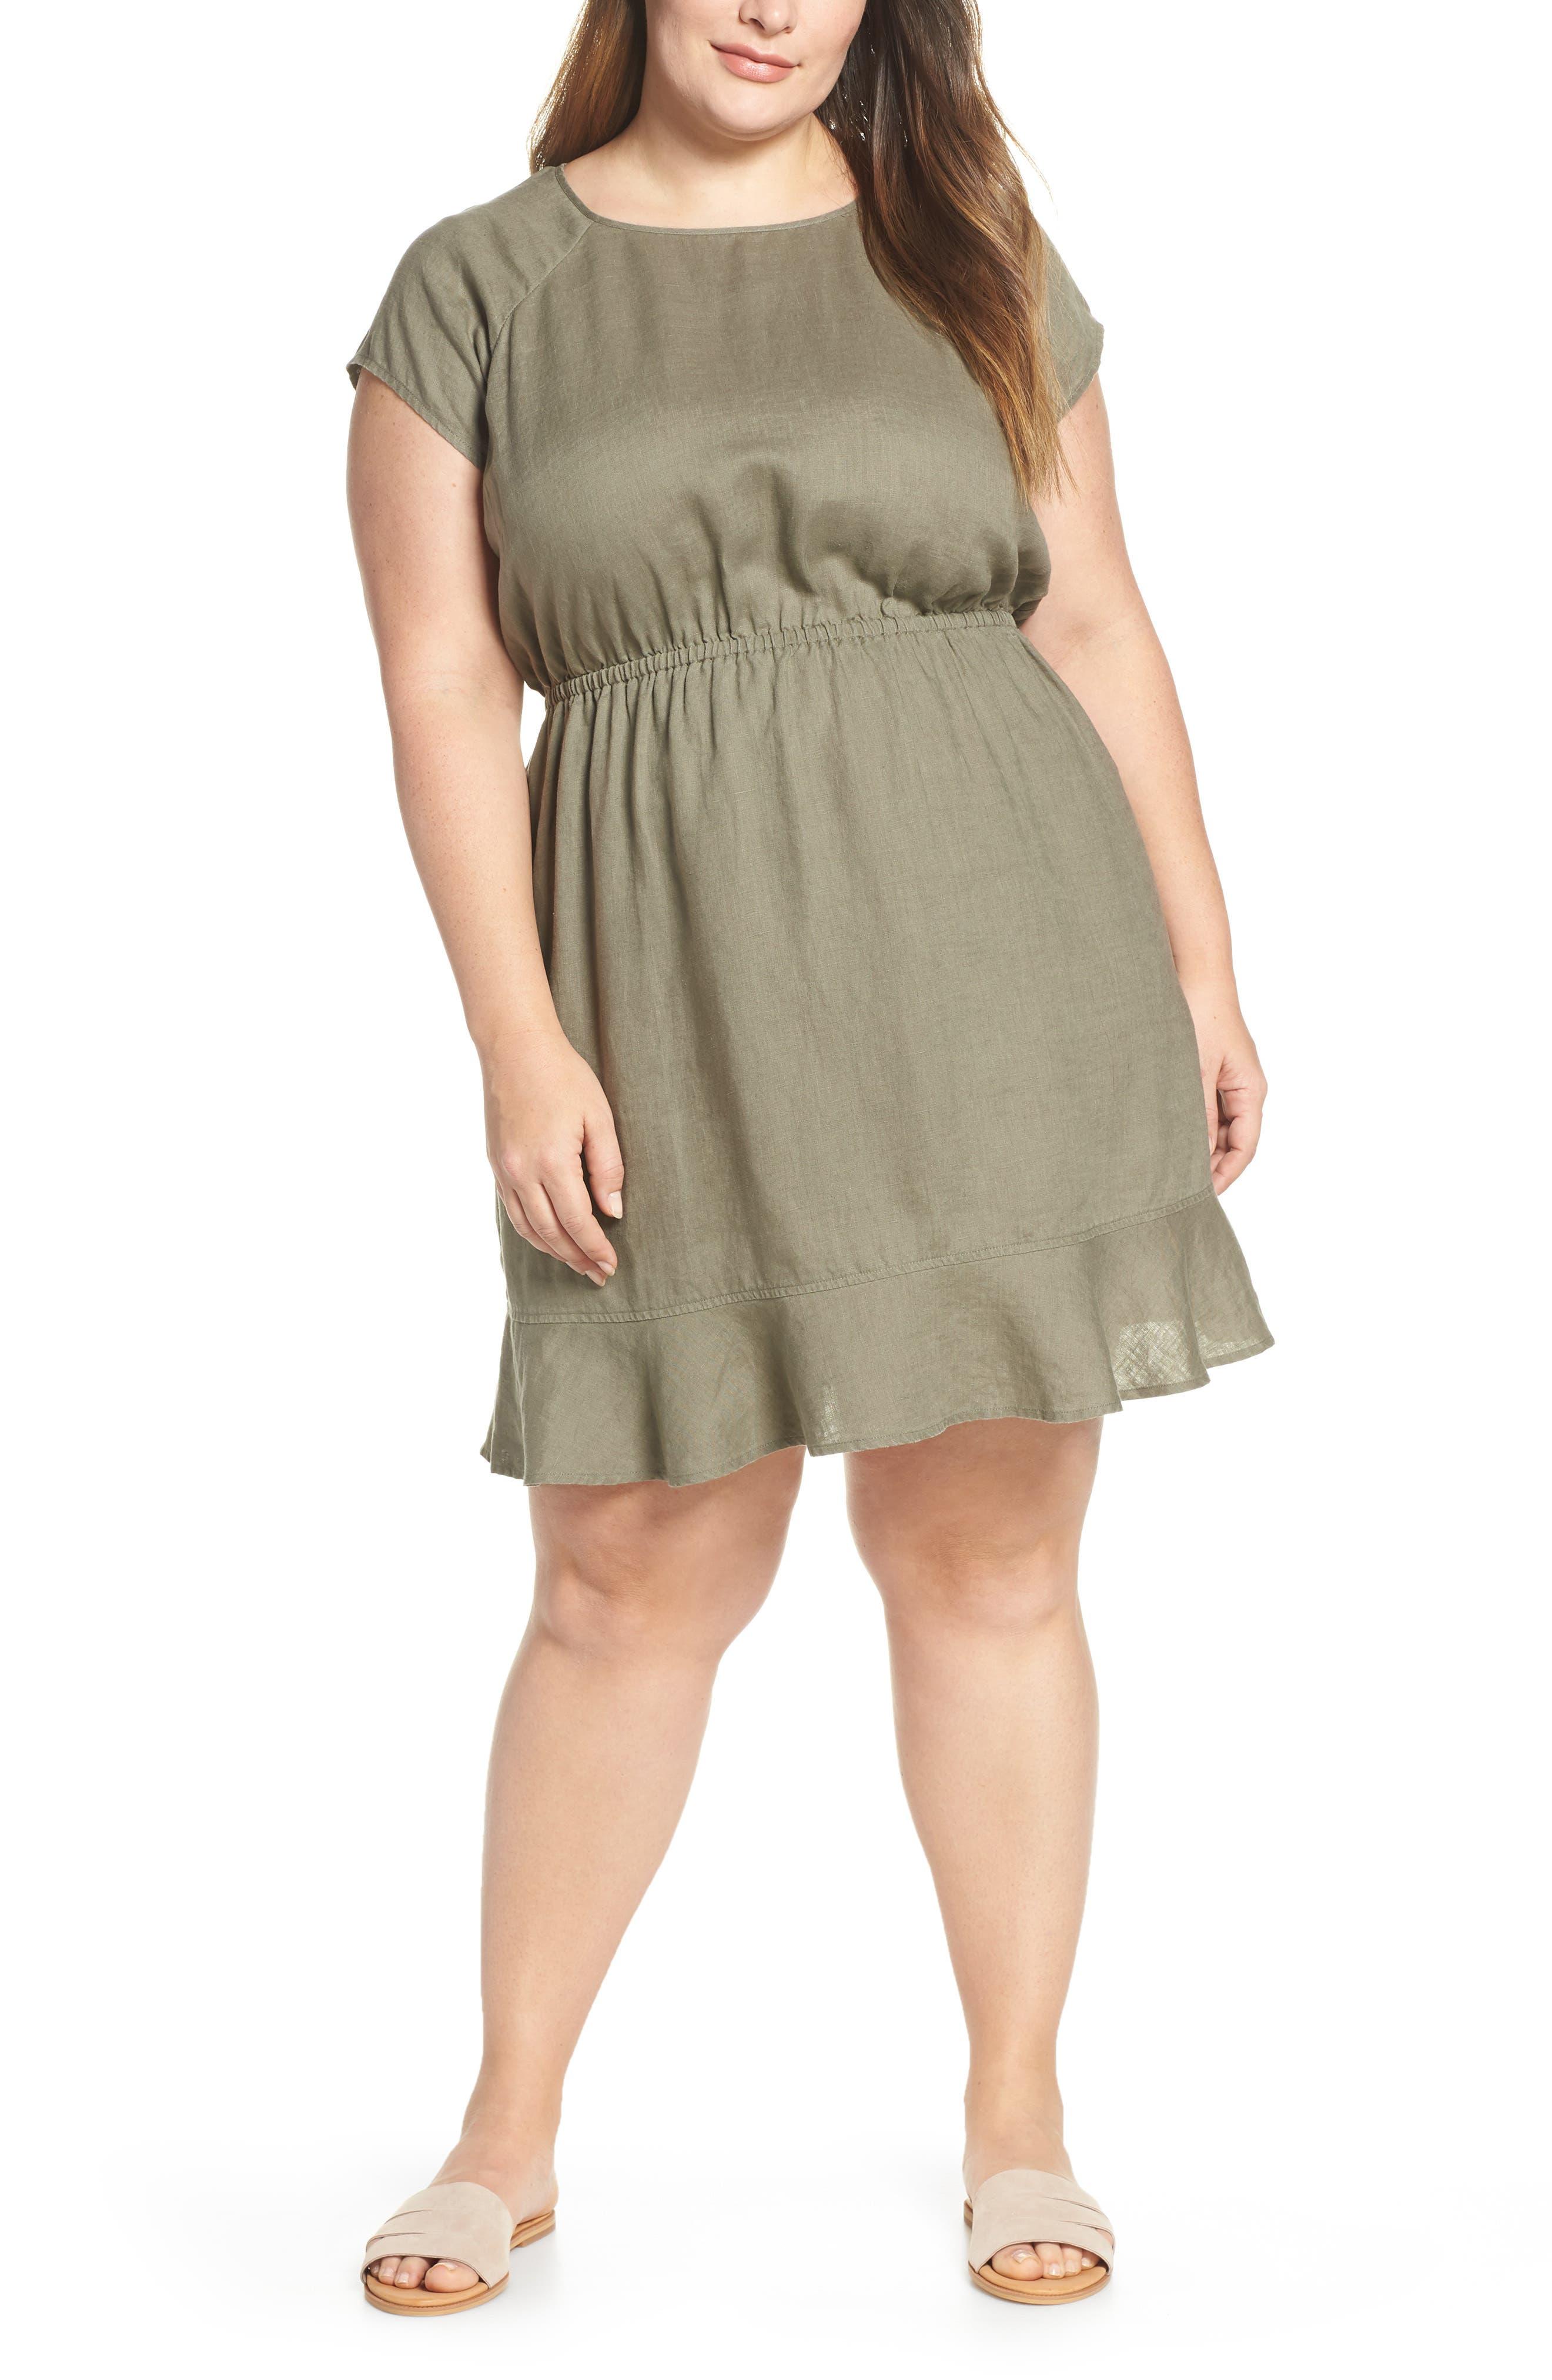 Plus Size Vince Camuto Extended Shoulder Linen Dress, Beige